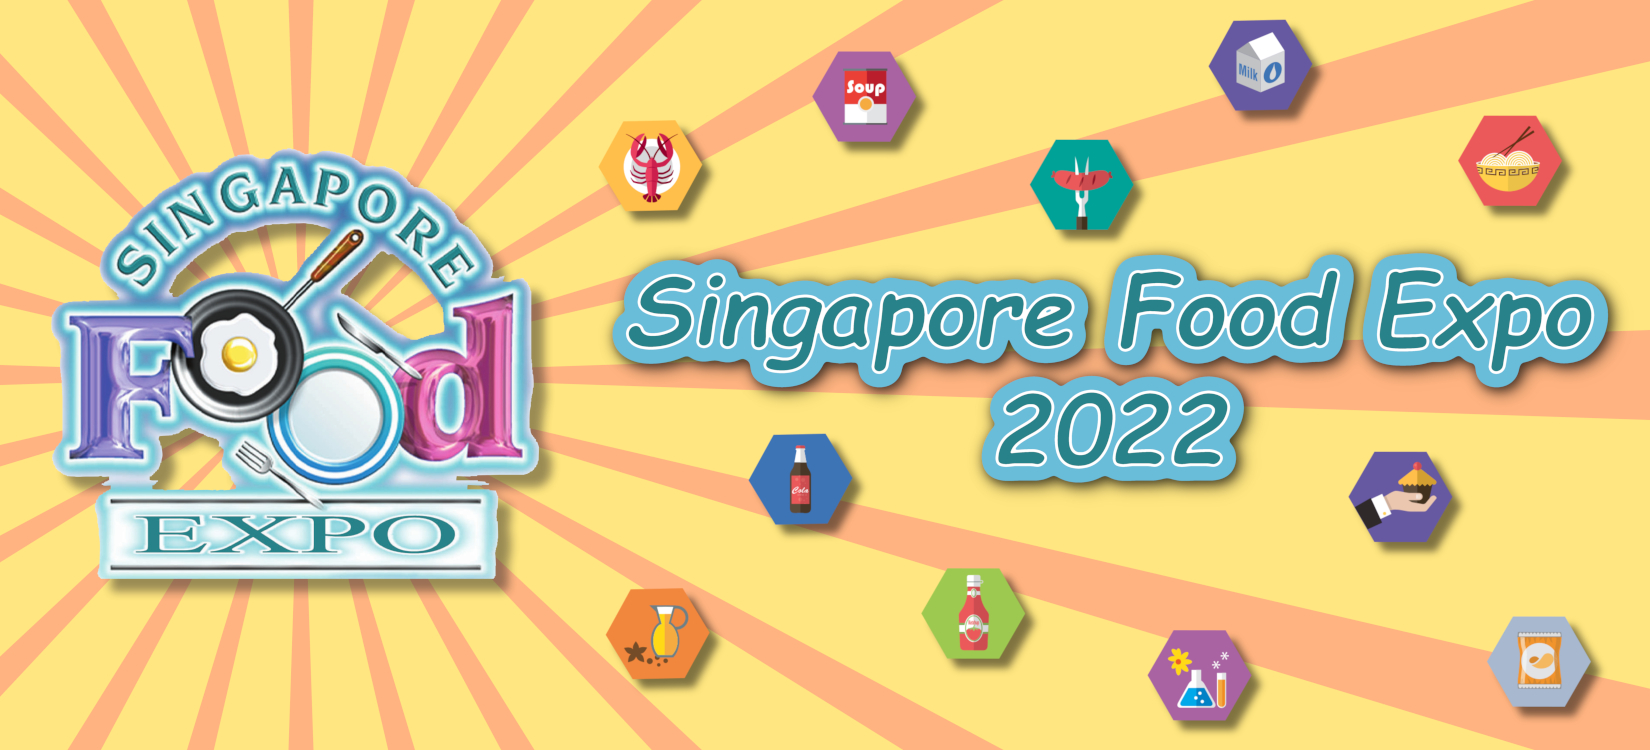 Singapore Food Expo